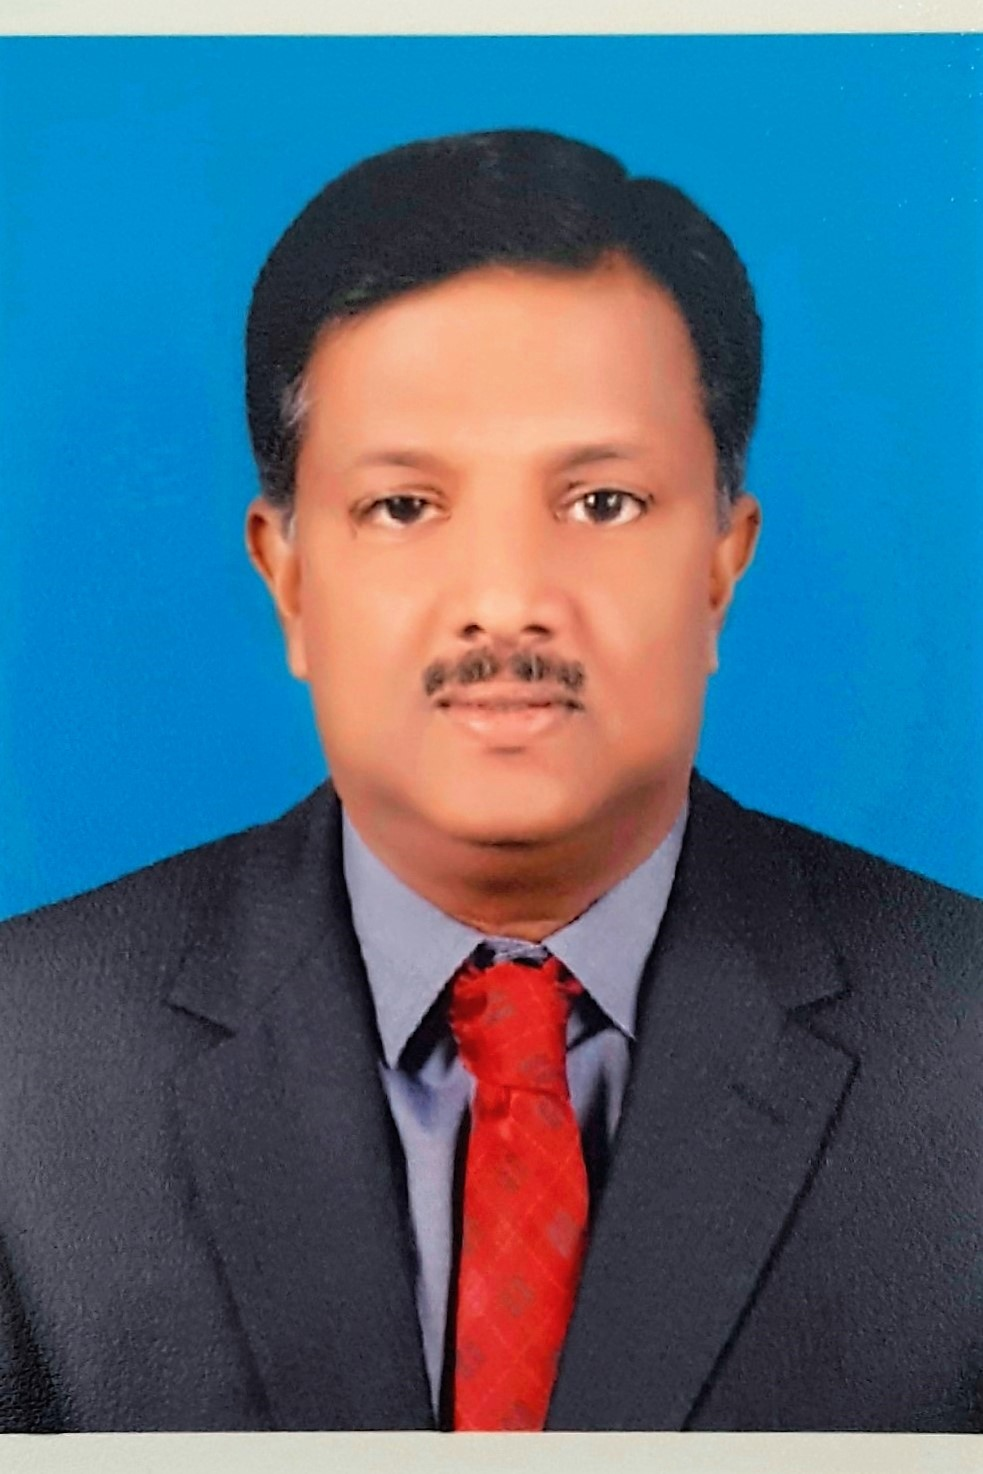 Mr. Anil Kumar Sadasivan